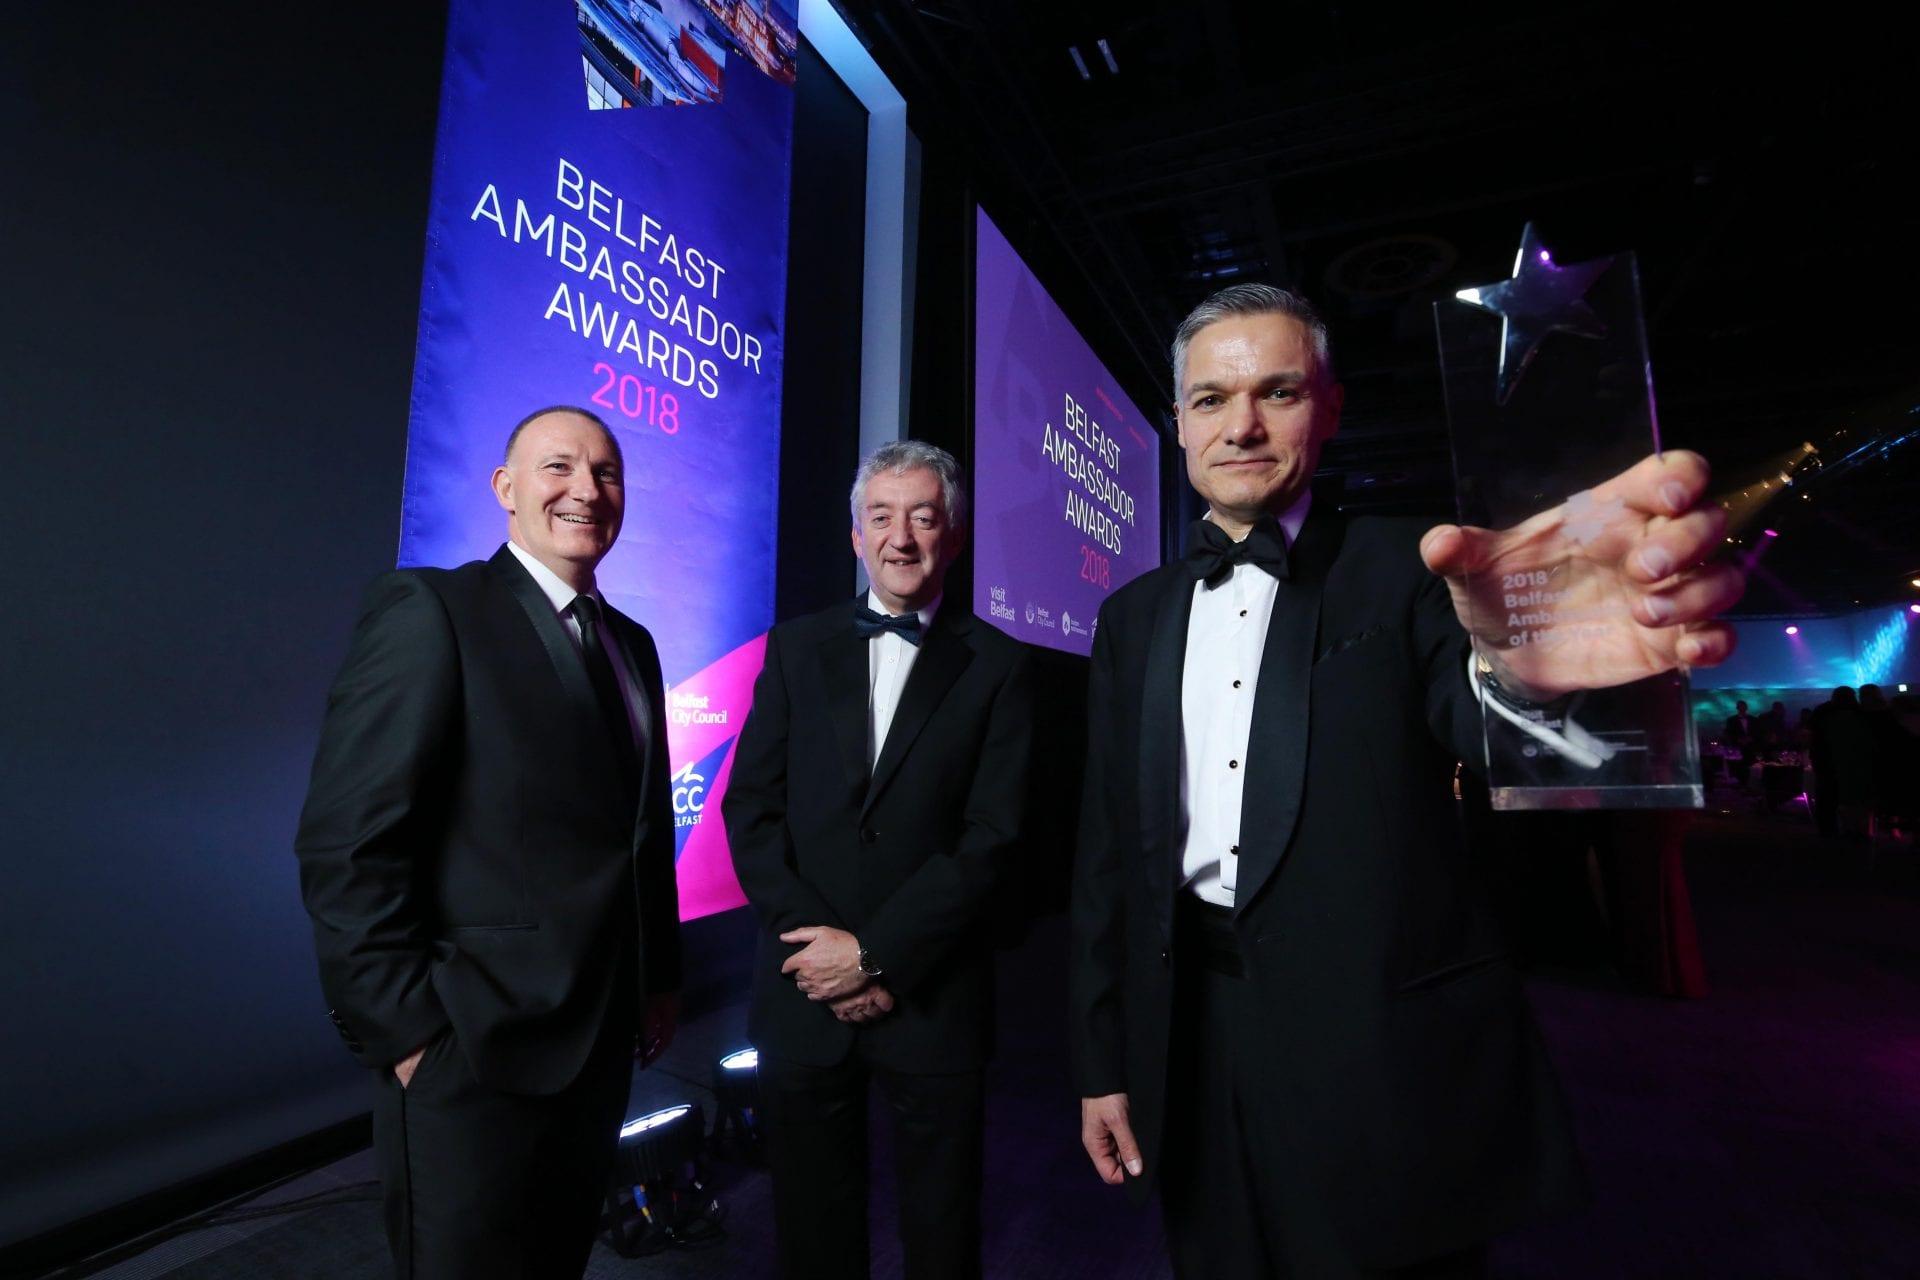 Belfast Ambassador Award